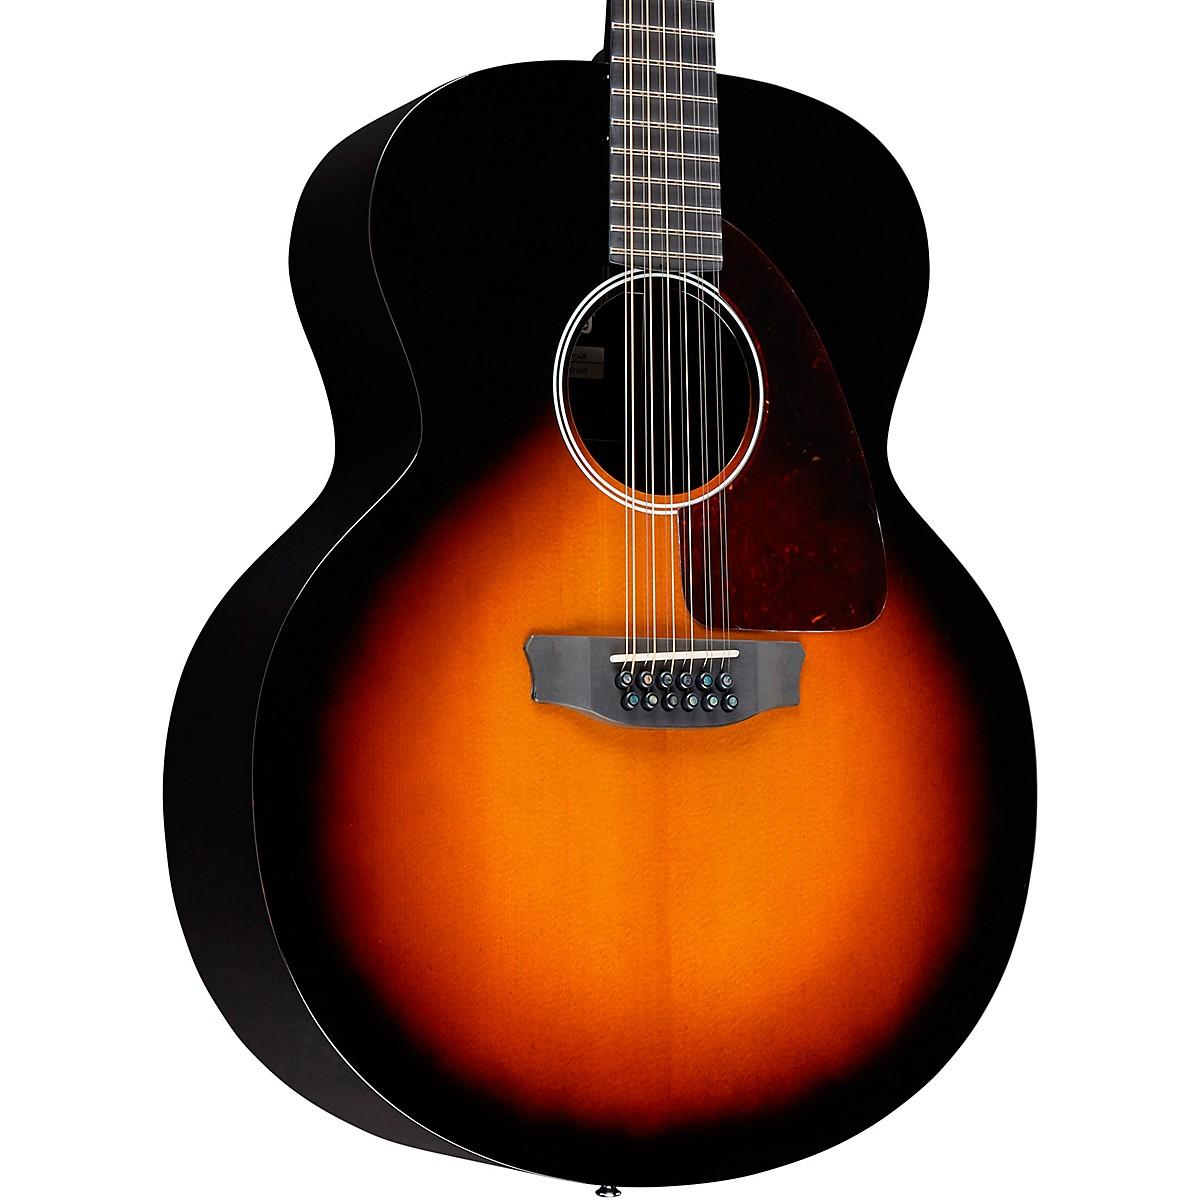 Rainsong Nashville Series Jumbo 12-string Acoustic Guitar